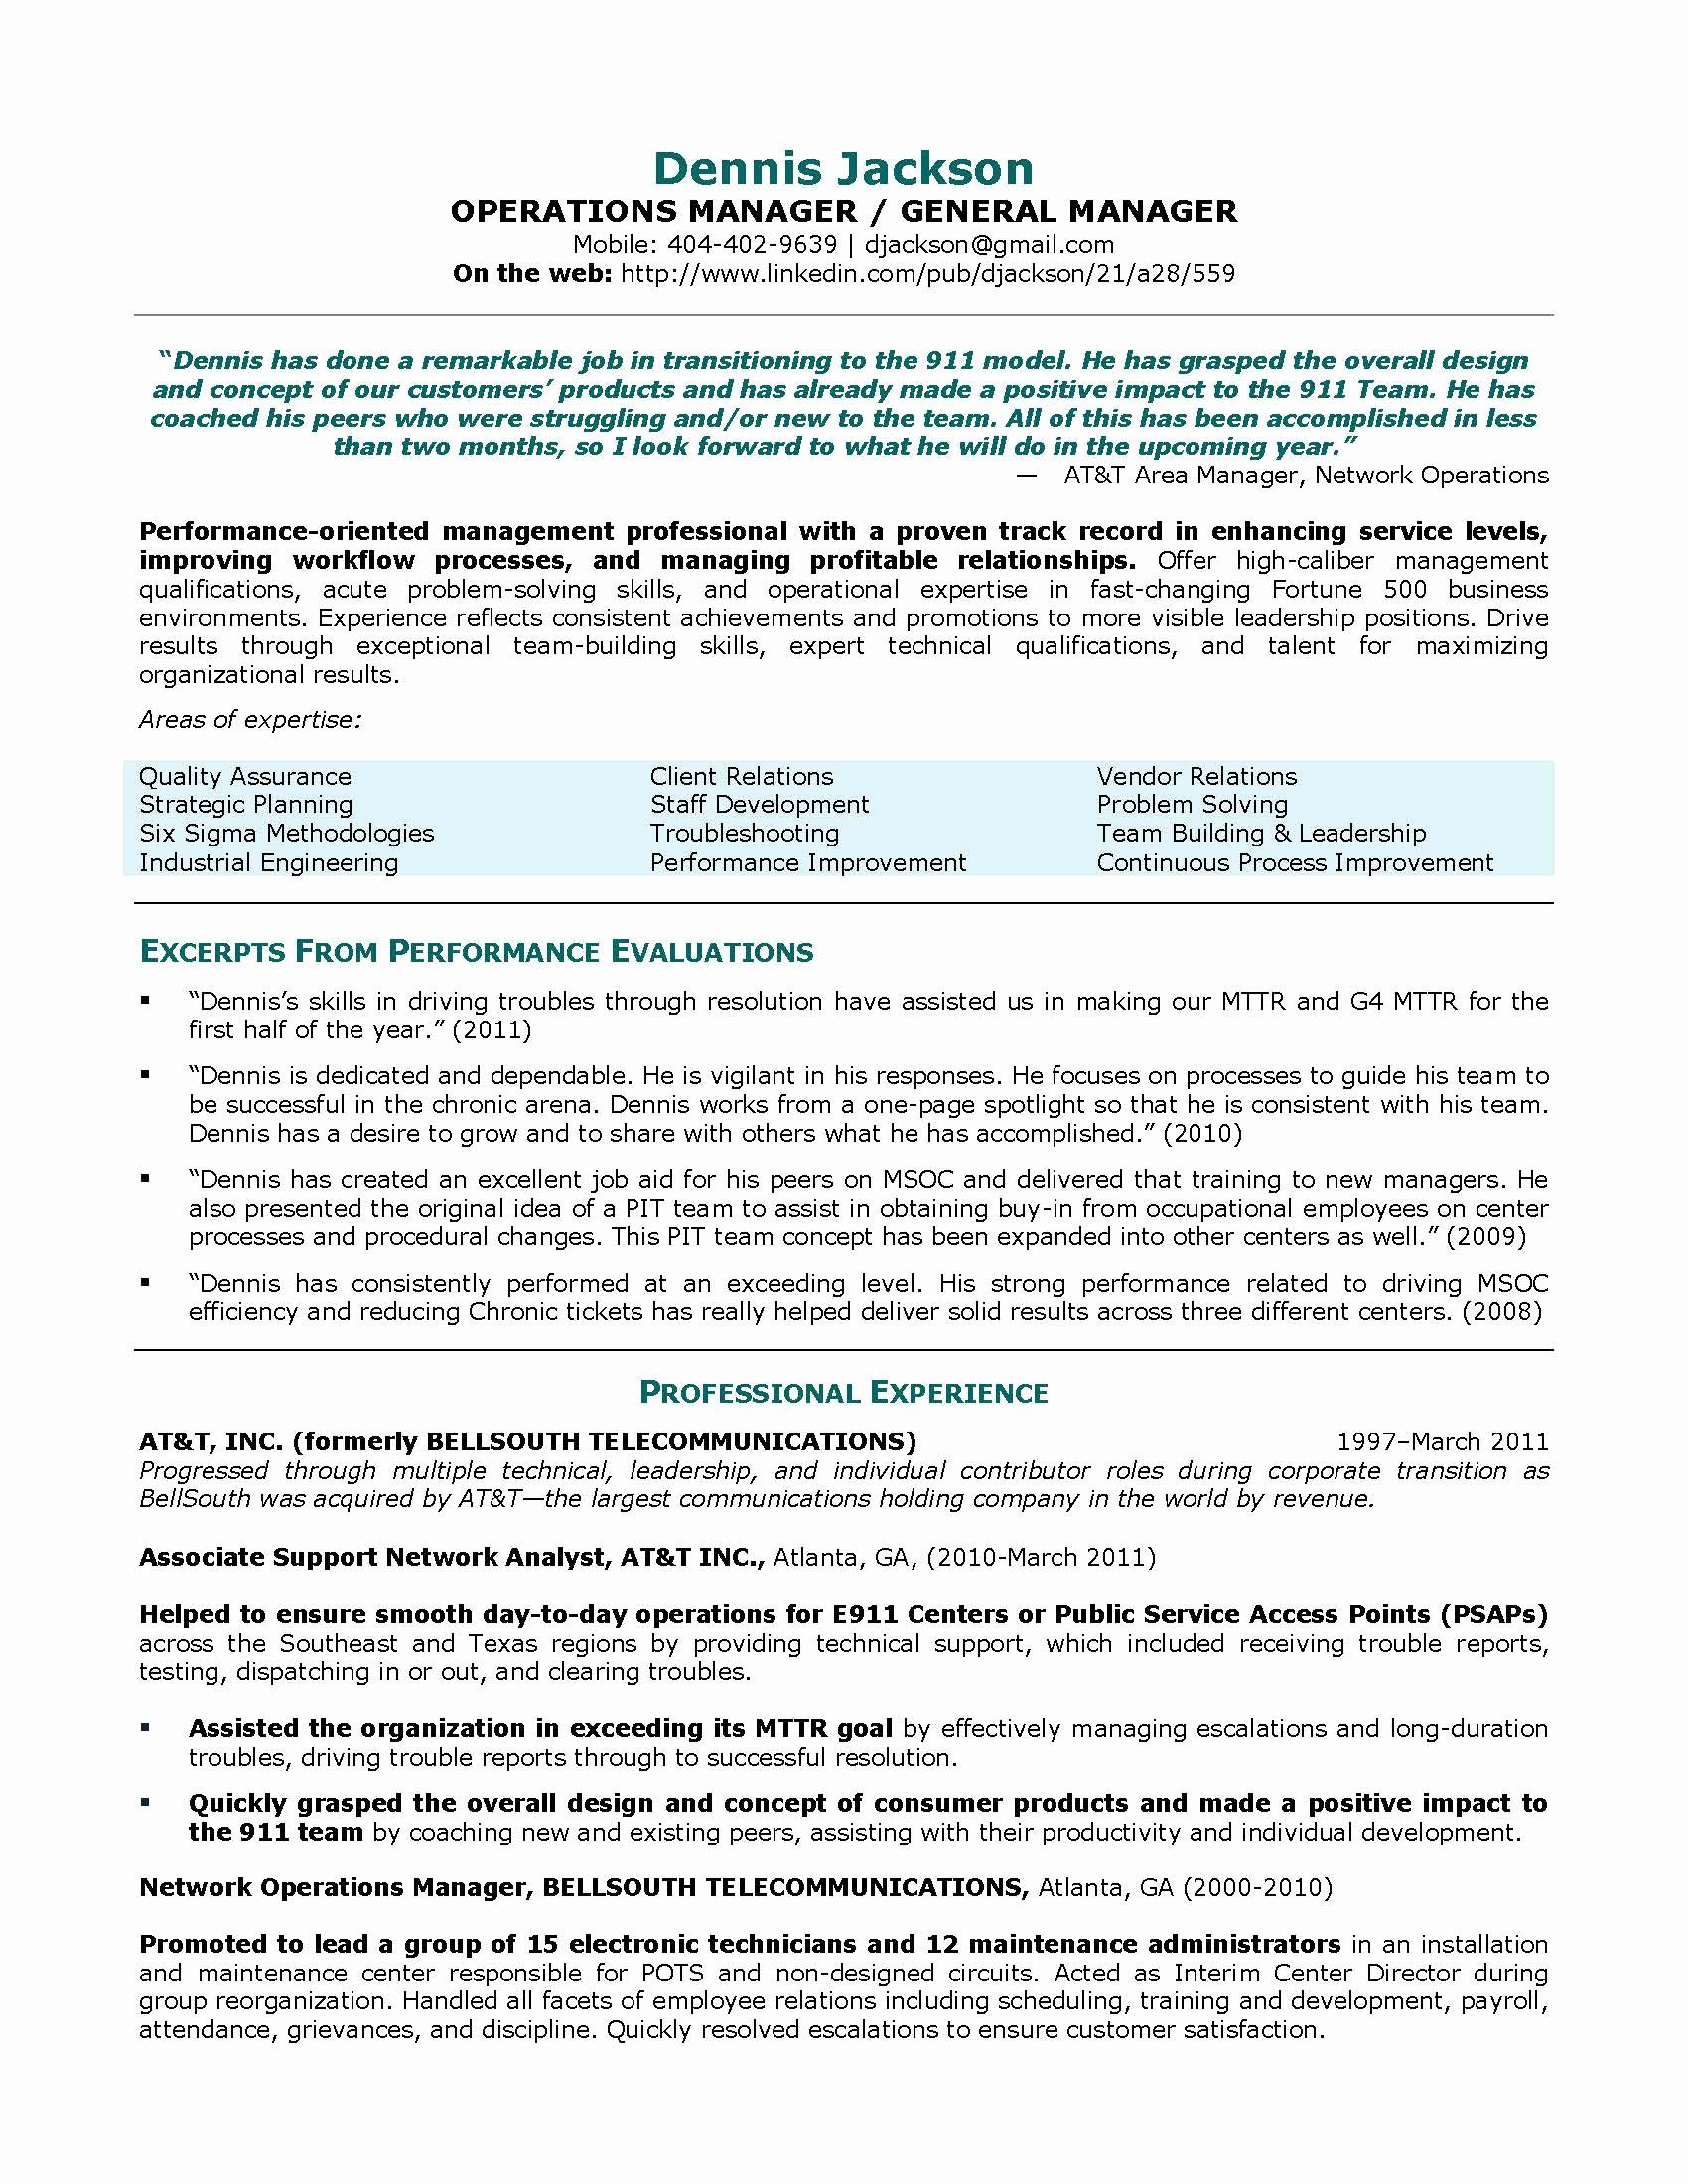 Sample Resume For Operations Manager In Bpo Valid Construction For Operations Manager Report Template